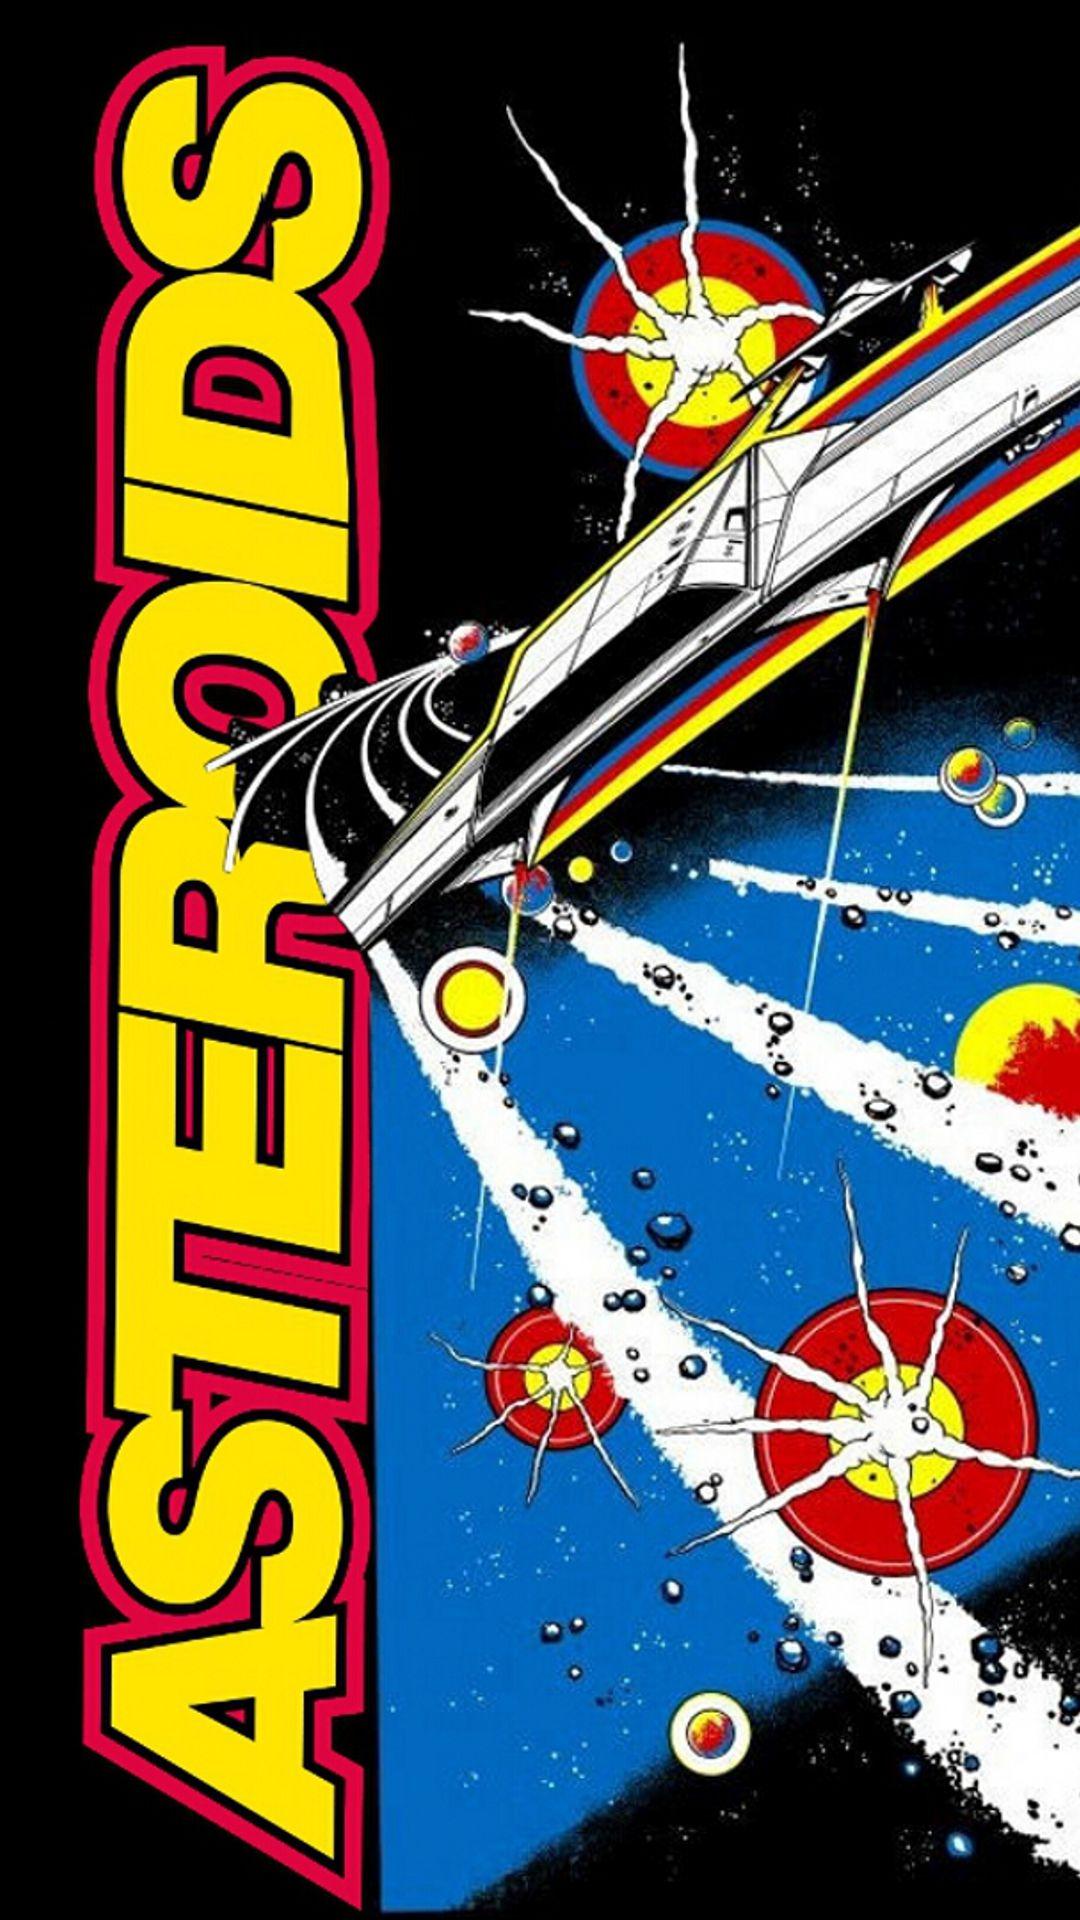 Arcade Retro Games Poster Retro Arcade Classic Video Games